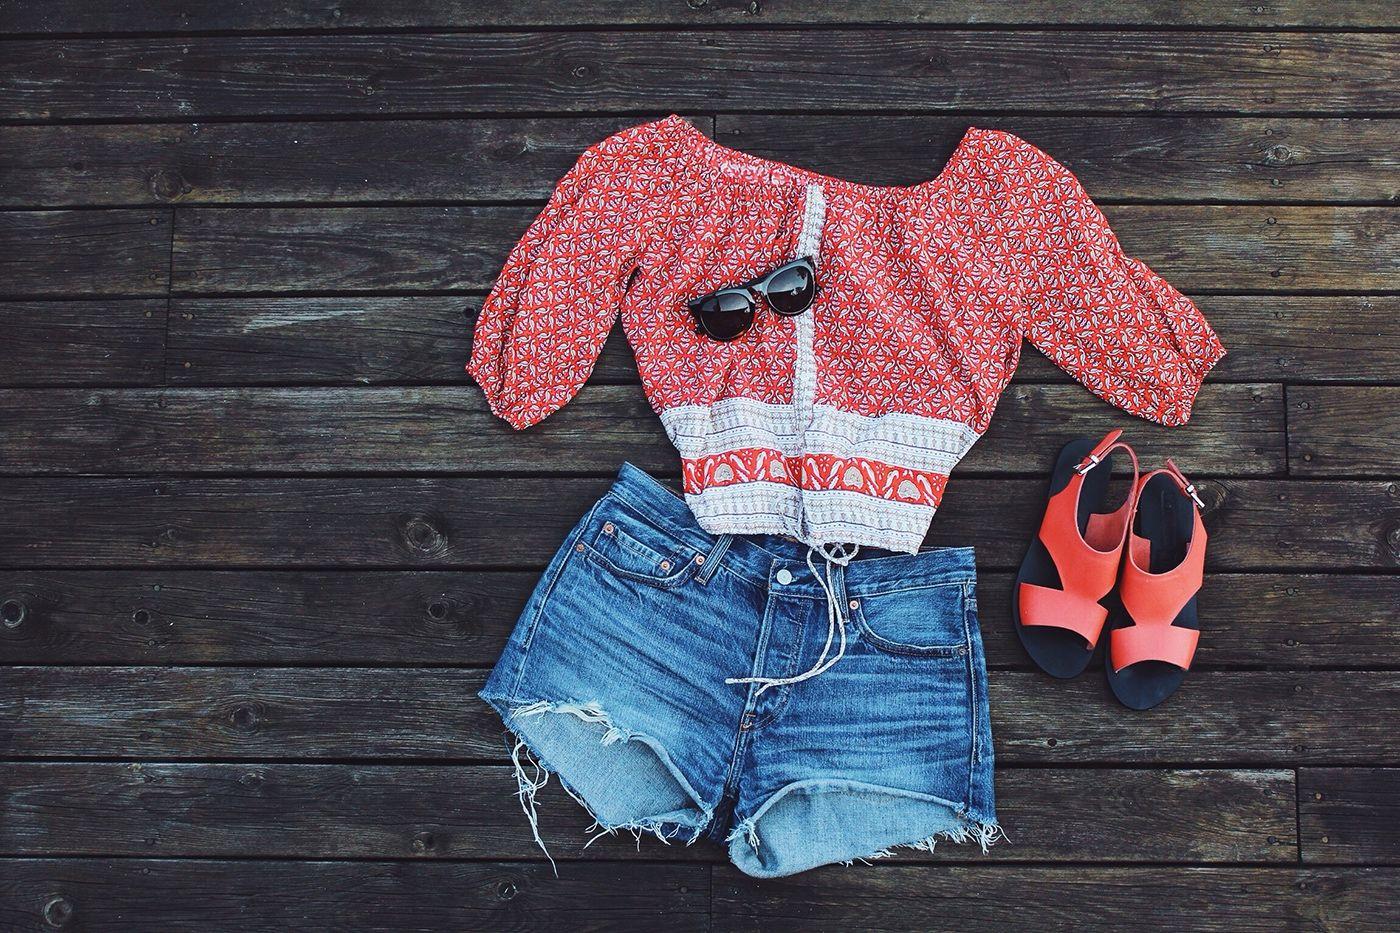 My Summer Essentials: Cute top and denim shorts